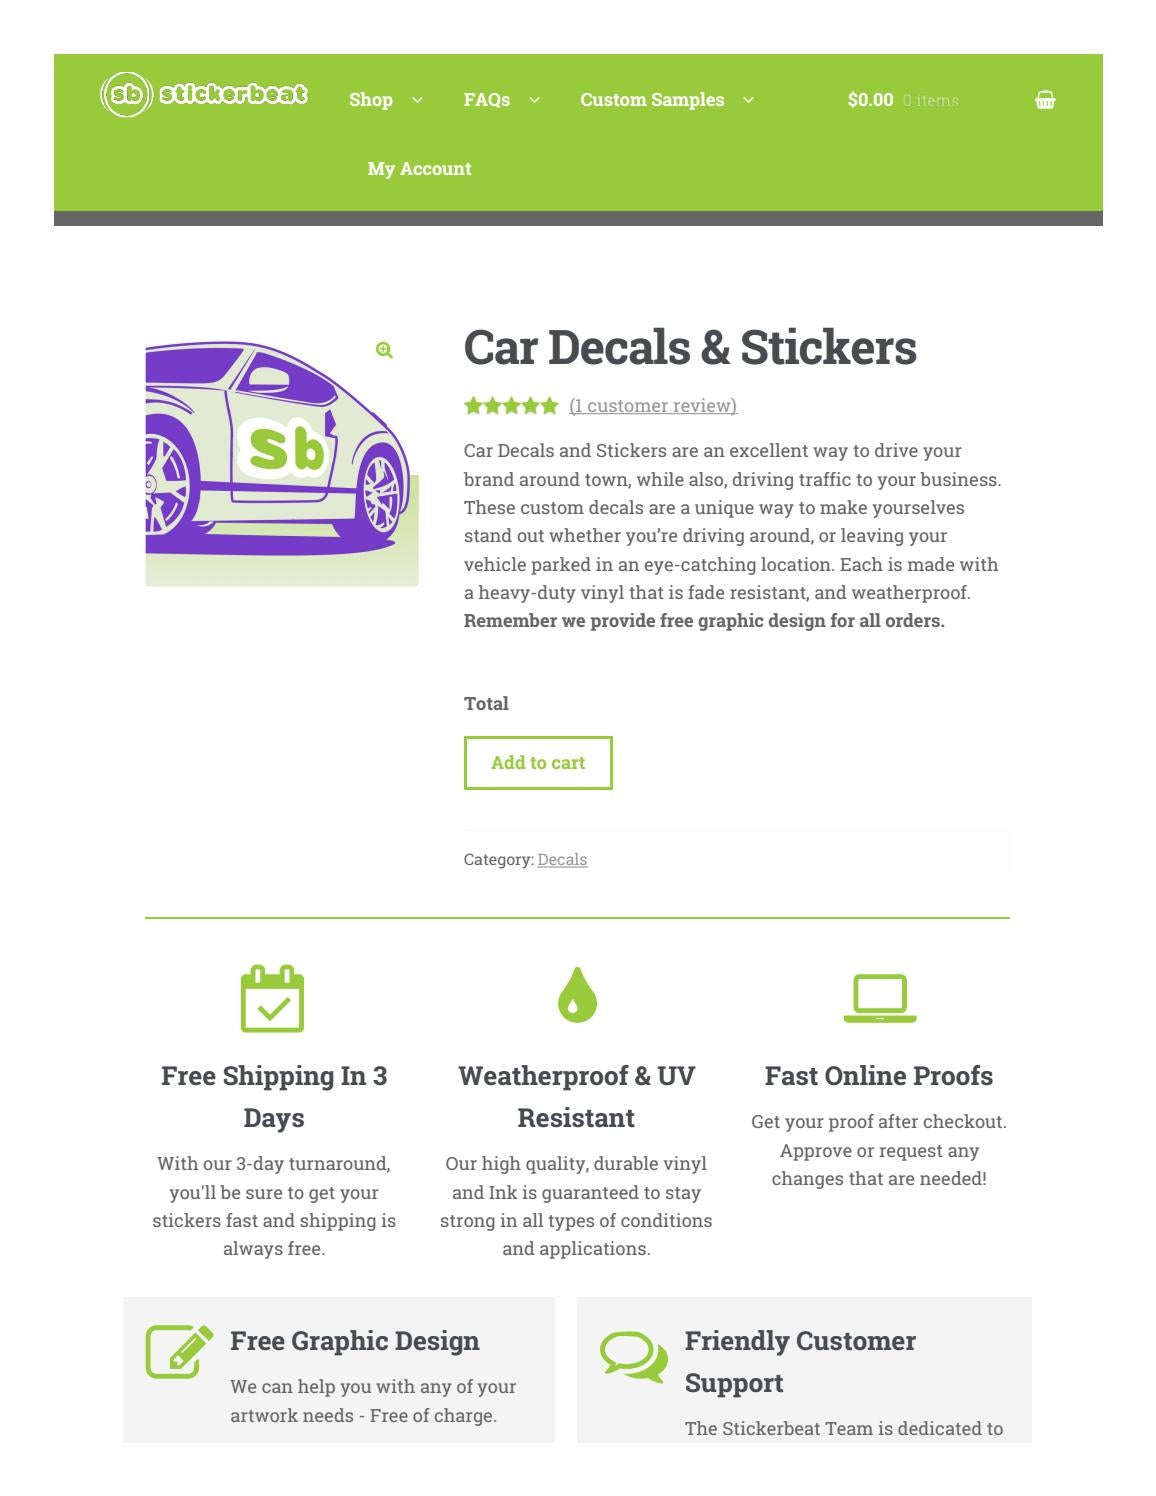 Sticker printing companies online